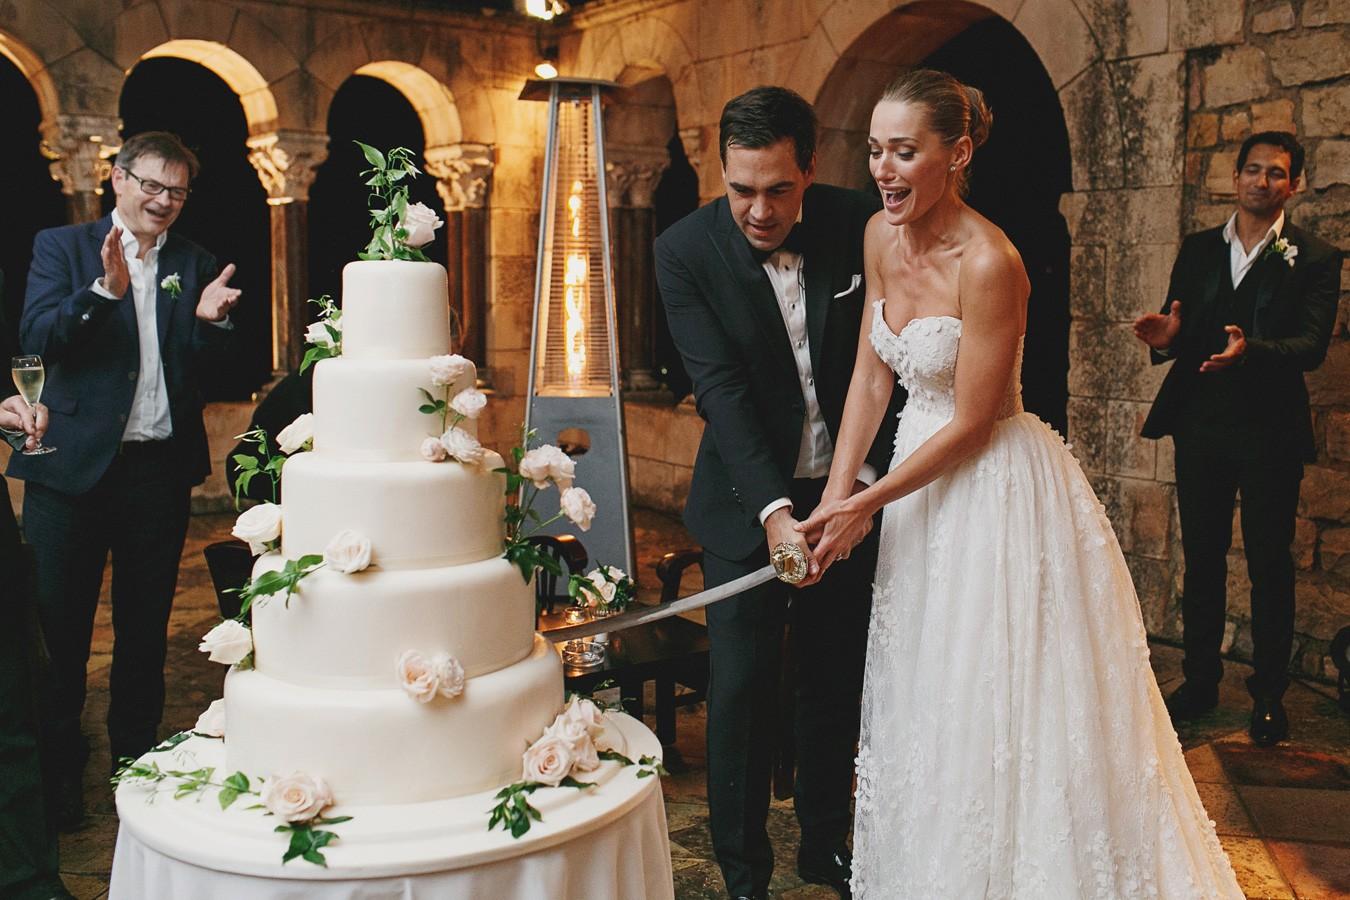 South France Wedding Dress